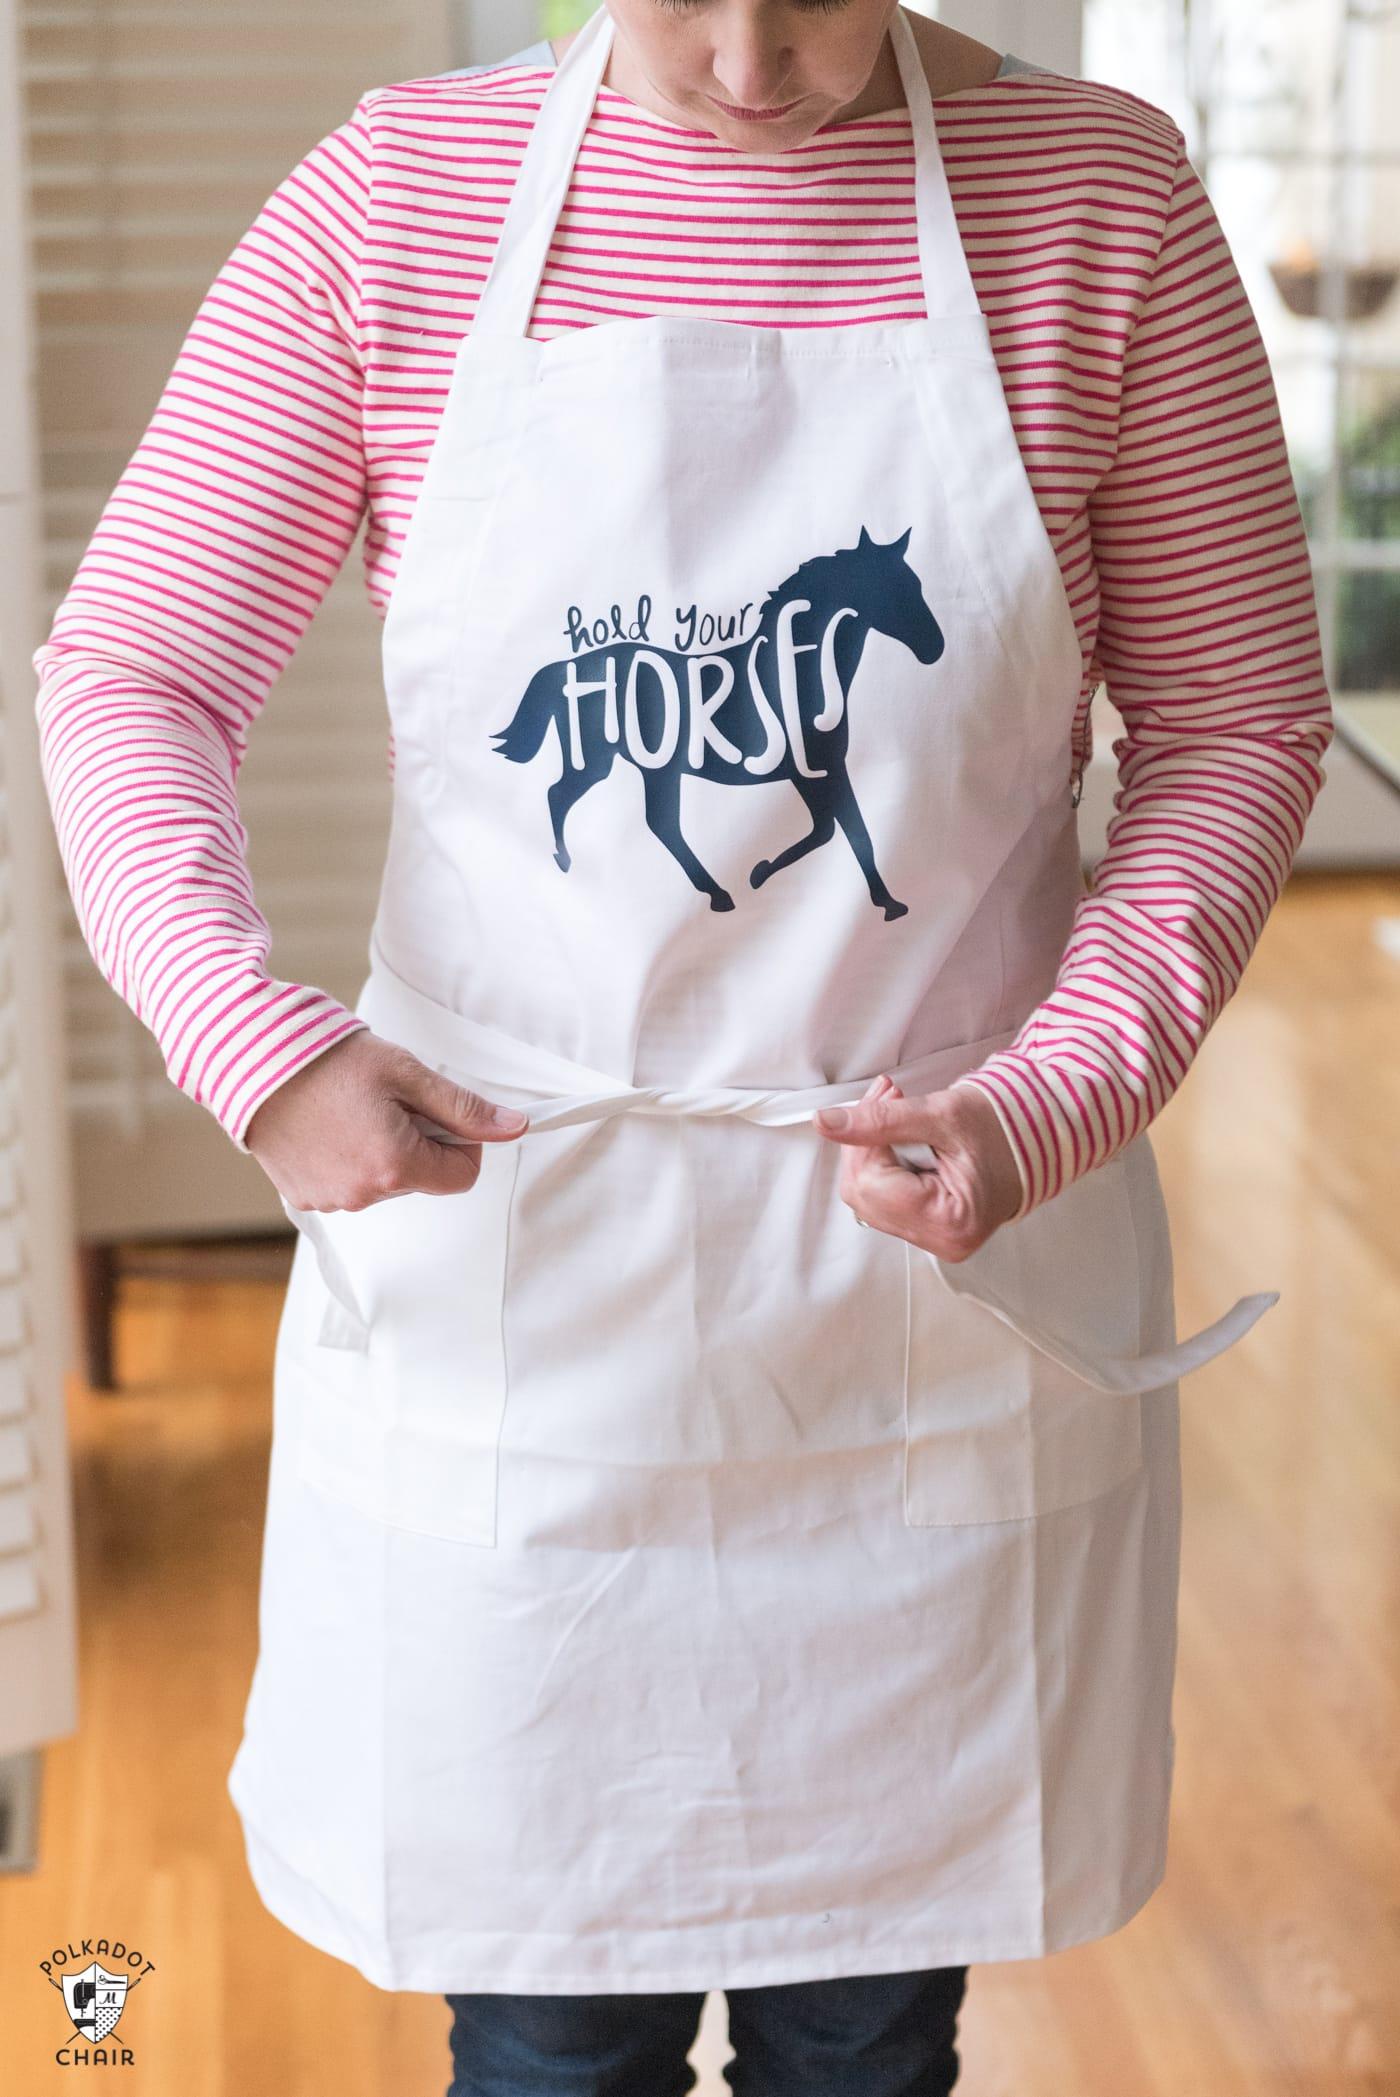 Hold your Horses DIY Apron tutorial, a fun Kentucky Derby Craft idea - #derbycrafts #derbycraftideas #kentuckyderby #DIY #DIYApron #CricutMade #SVGFiles #HorseSVGFiles